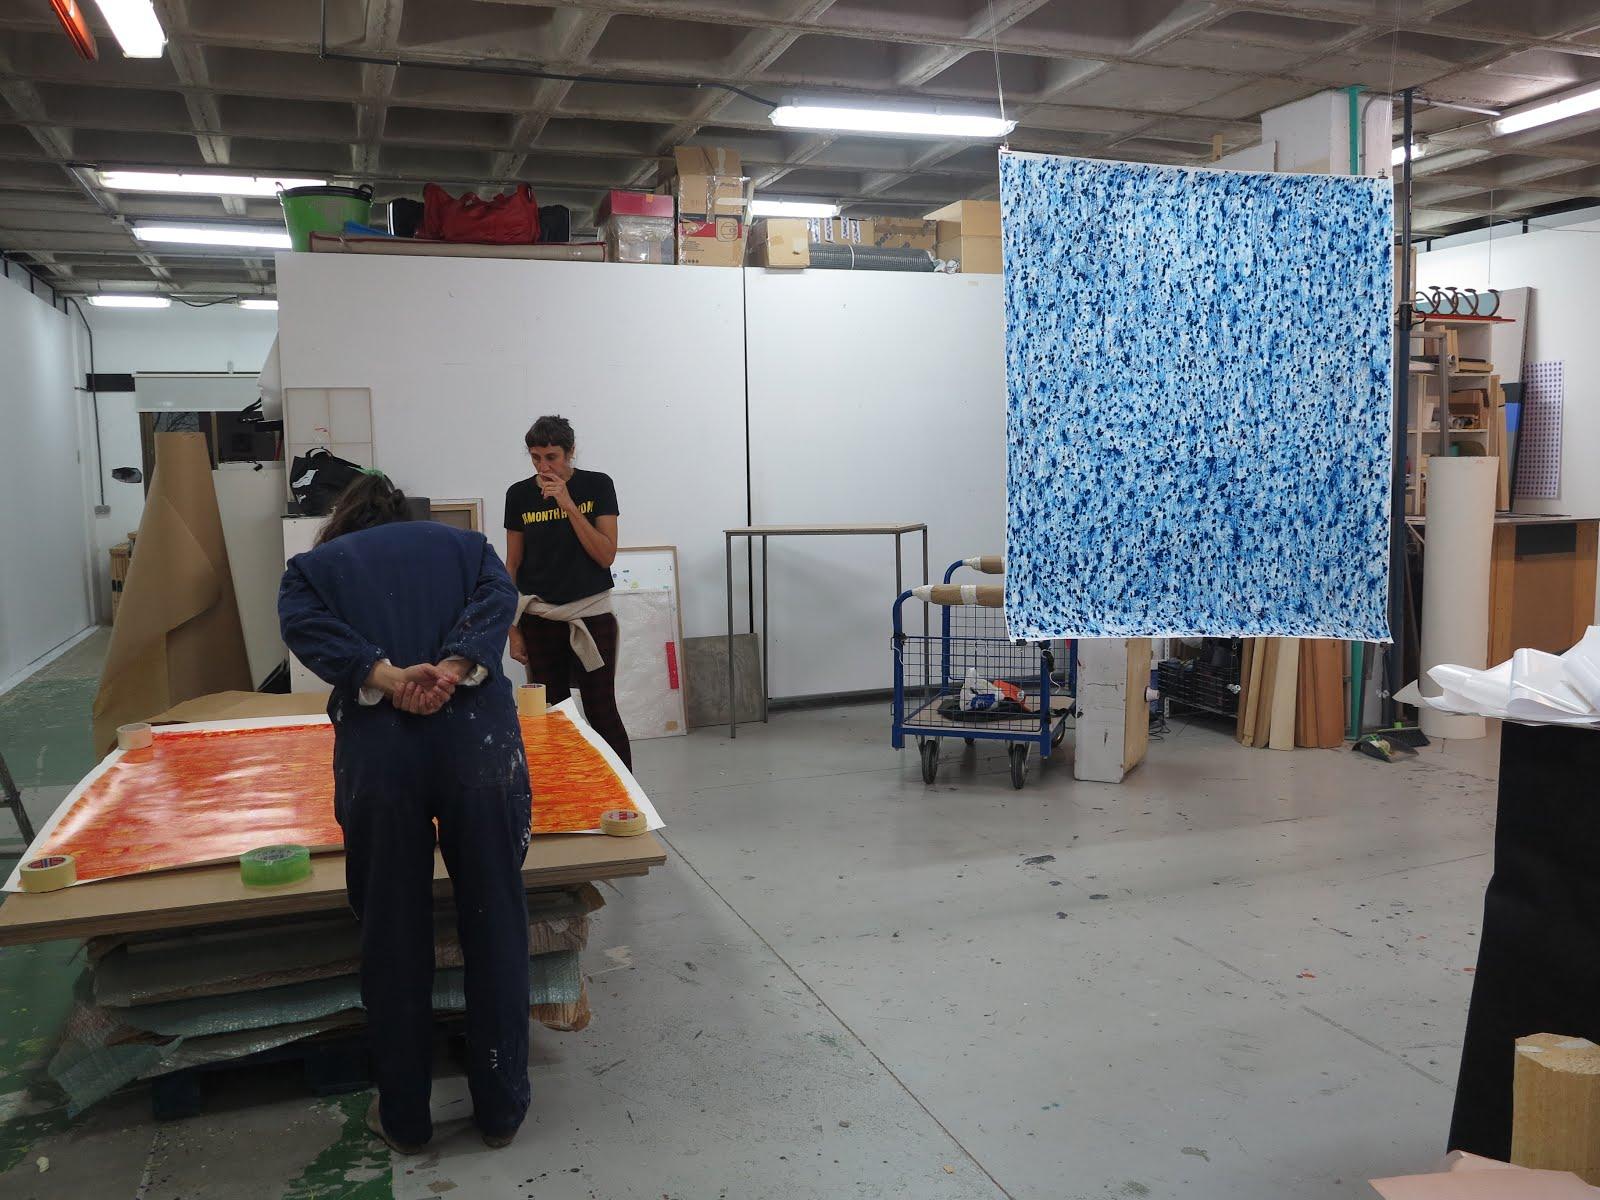 montaje muestra en Nave Oporto